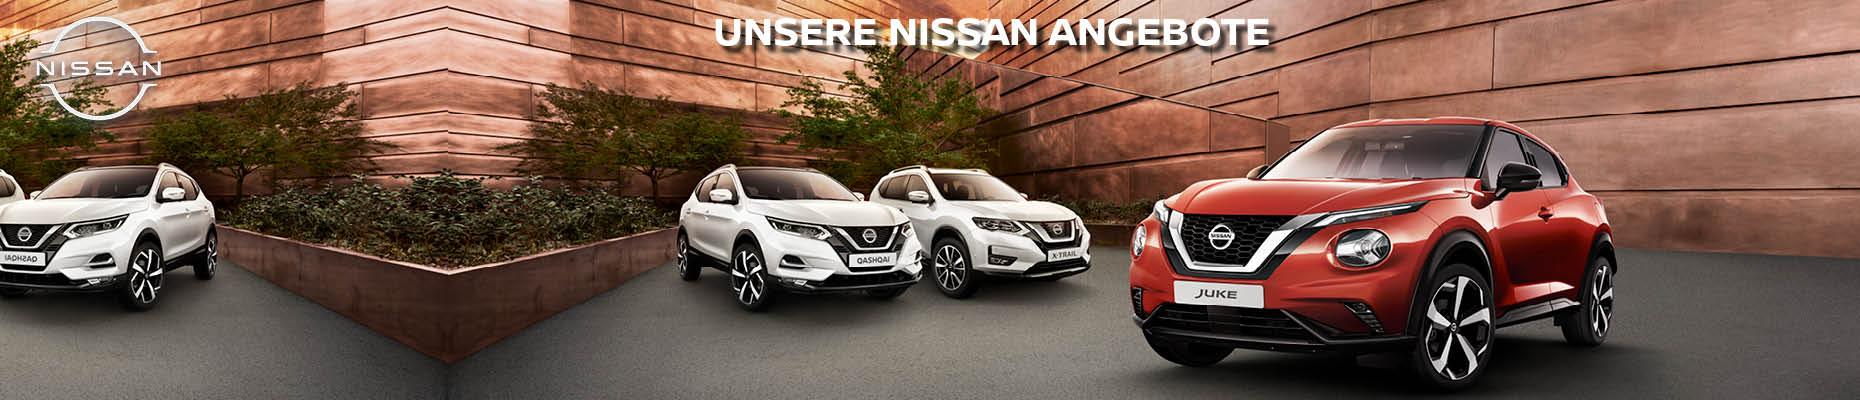 1860x400_Nissan Angebot